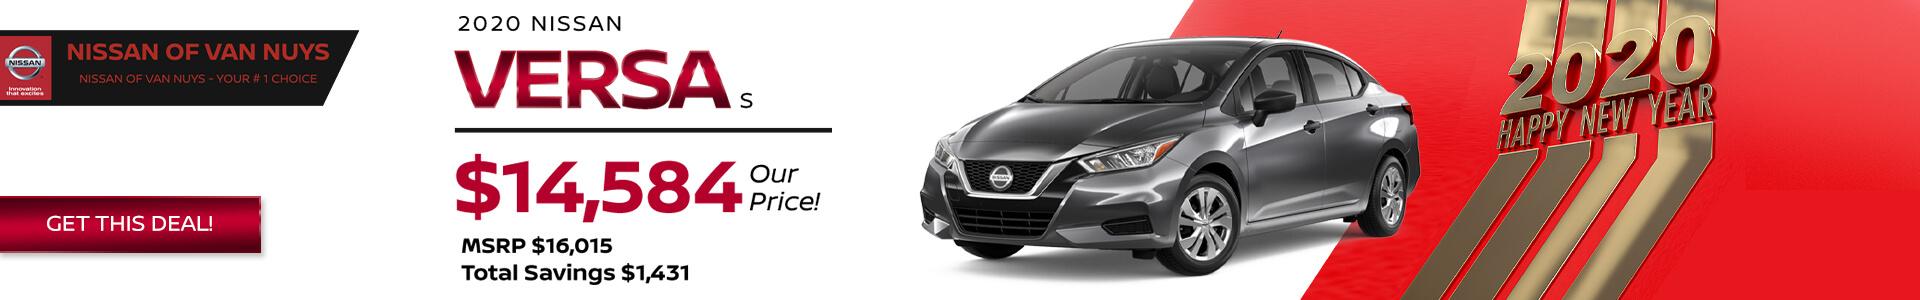 Nissan Versa SRP